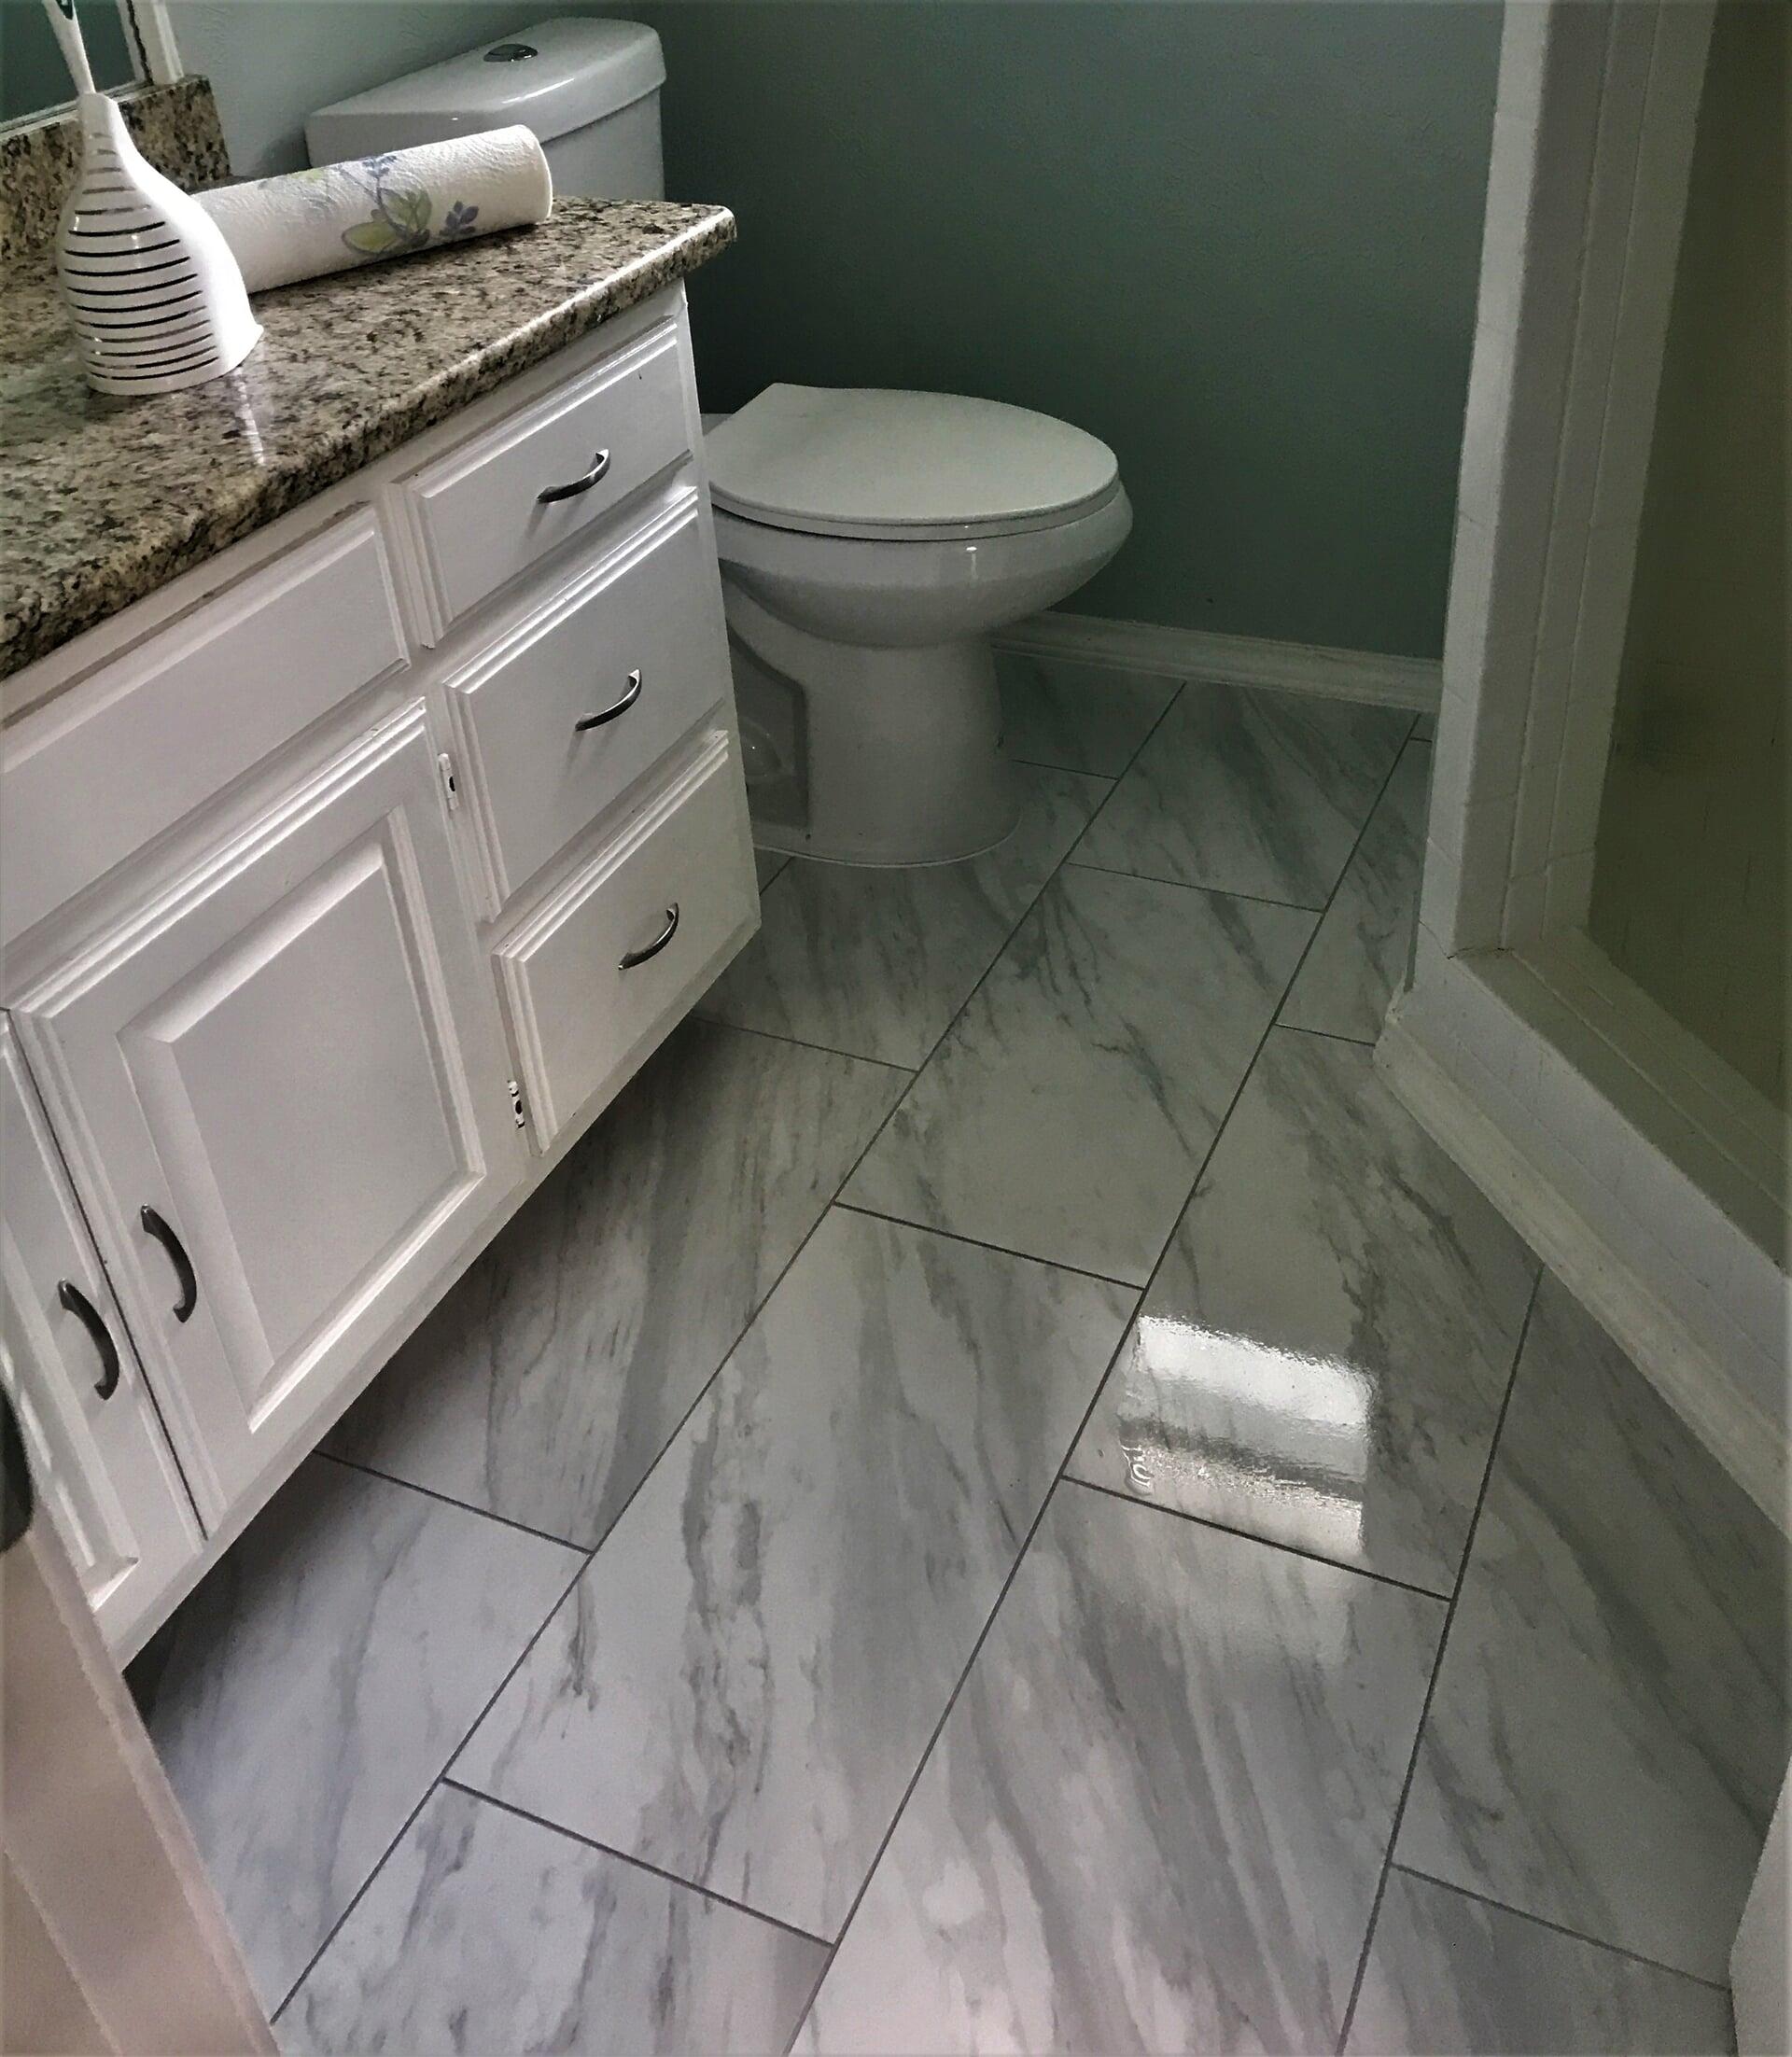 Marble tile flooring in Fort Worth, TX from SJ FloorSolutions LLC